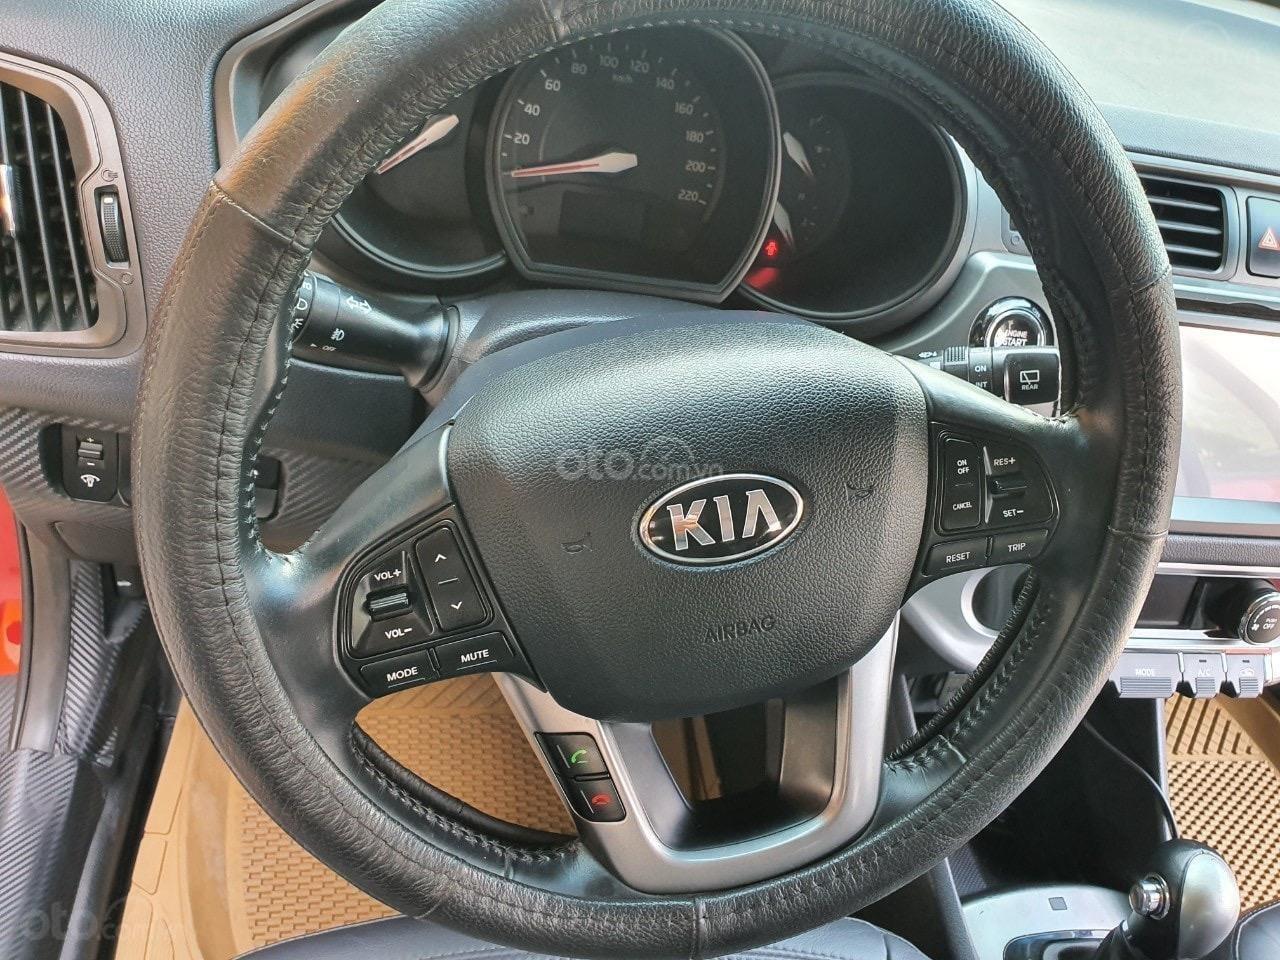 Kia Rio Hatchback 1.4 - 2014 (5)